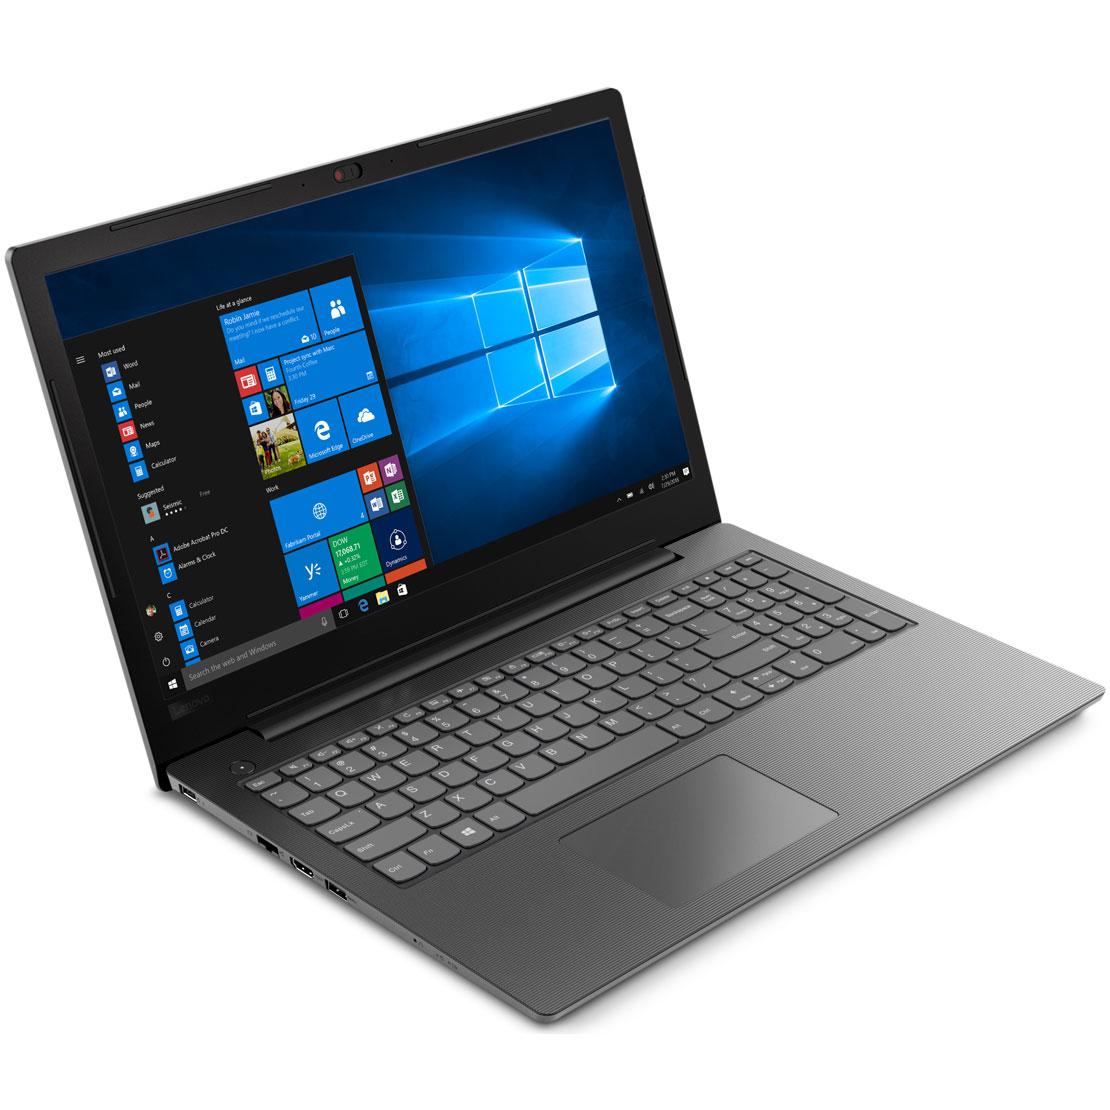 "PC portable 15.6"" Lenovo V130-15 (Qwertz) - N4000, RAM 4Go, SSD 128Go (Frontaliers Suisse)"